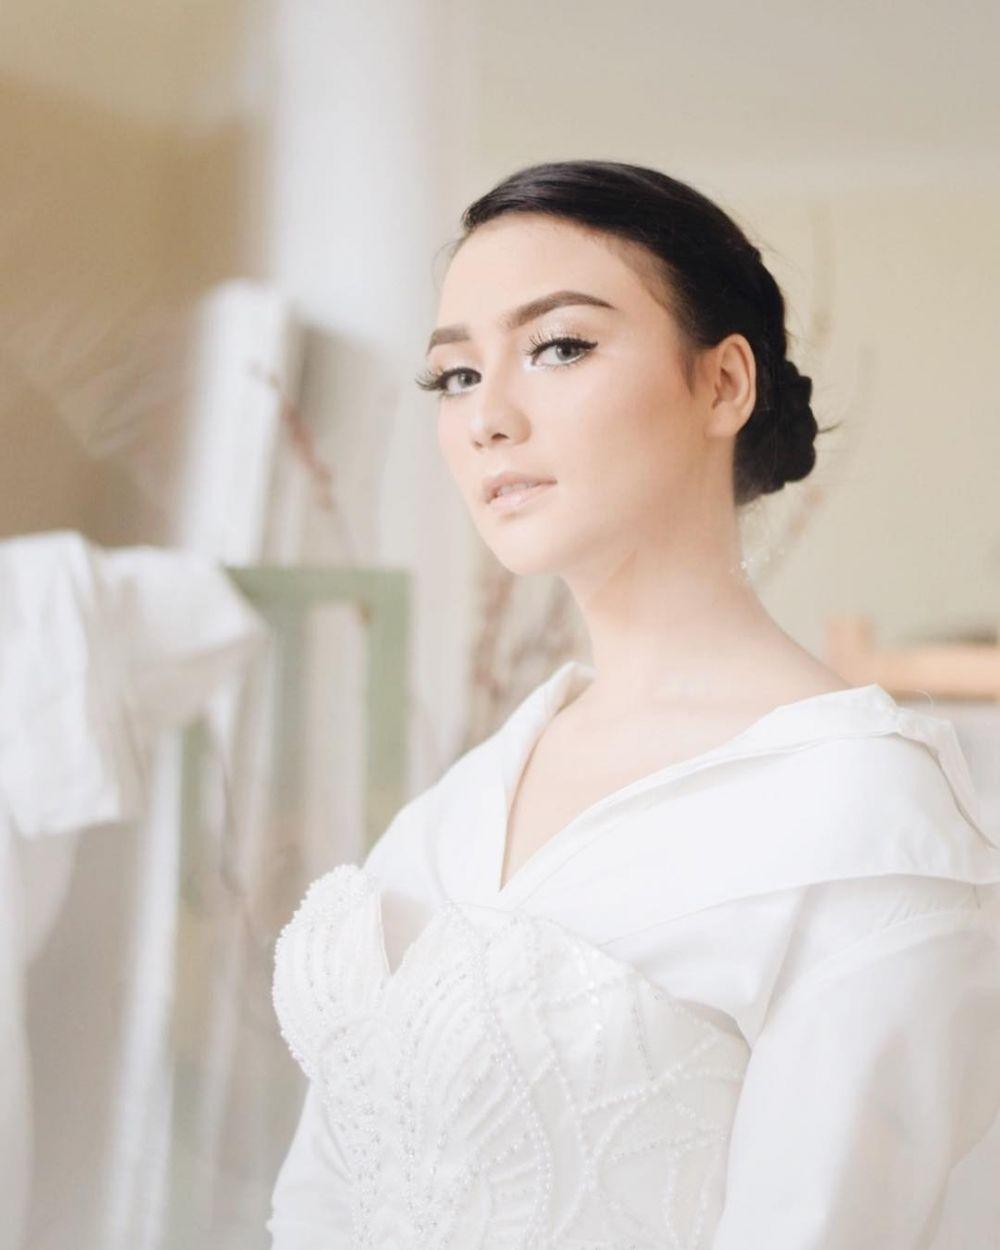 Citra Kirana pemotretan pakai baju pengantin © 2018 instagram